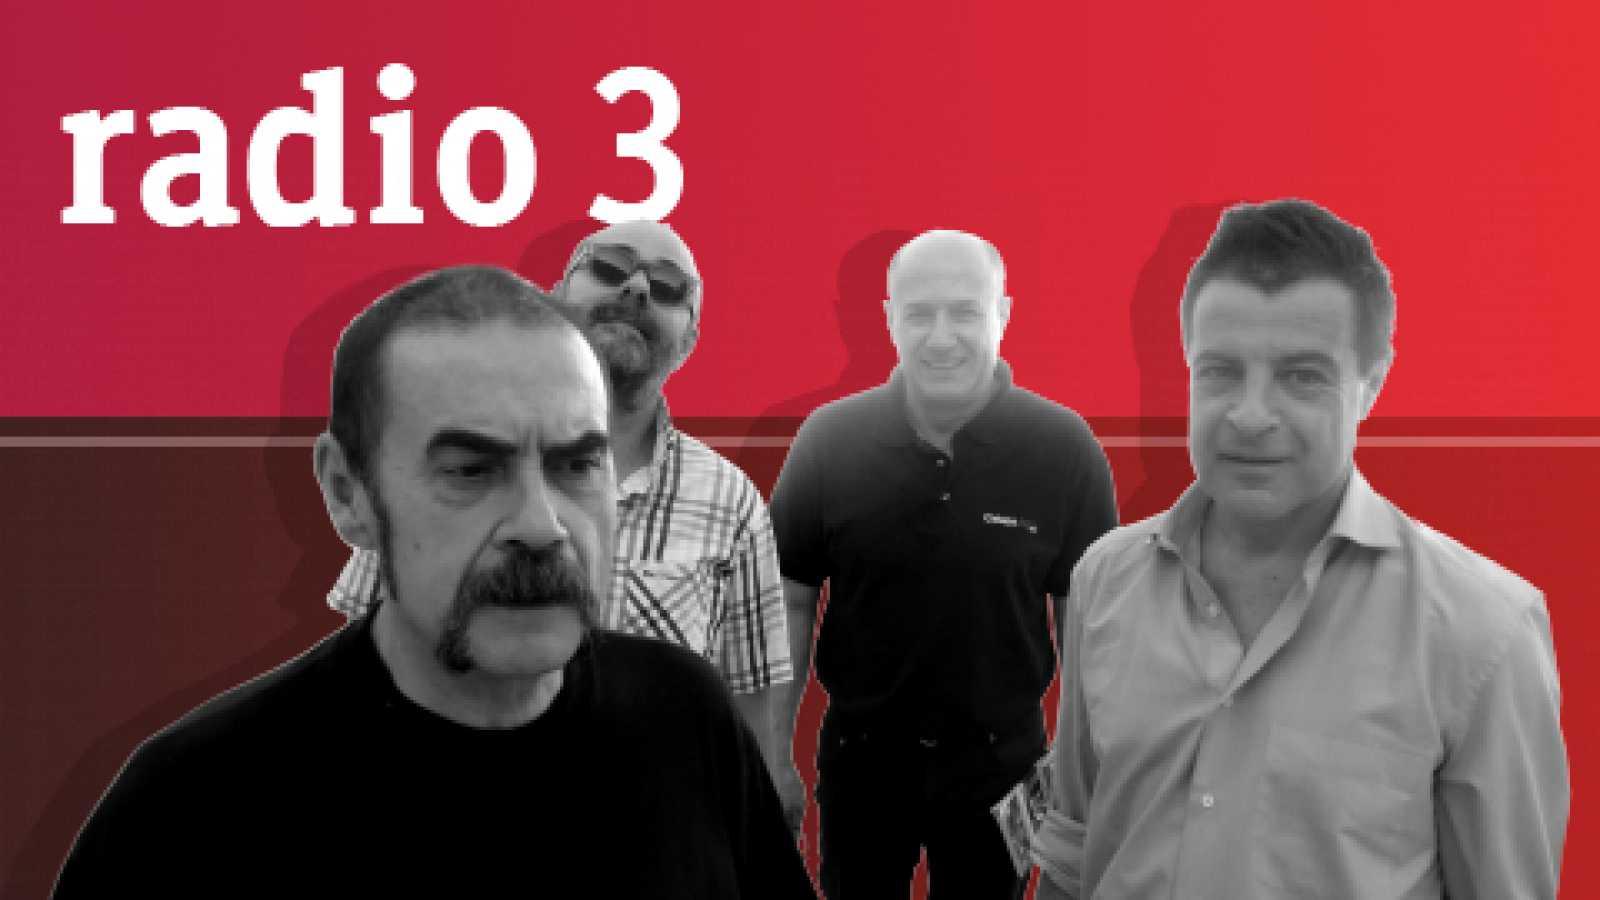 Sonideros: Kiko Helguera & Rodolfo Poveda - Proximidades - 13/10/19 - escuchar ahora